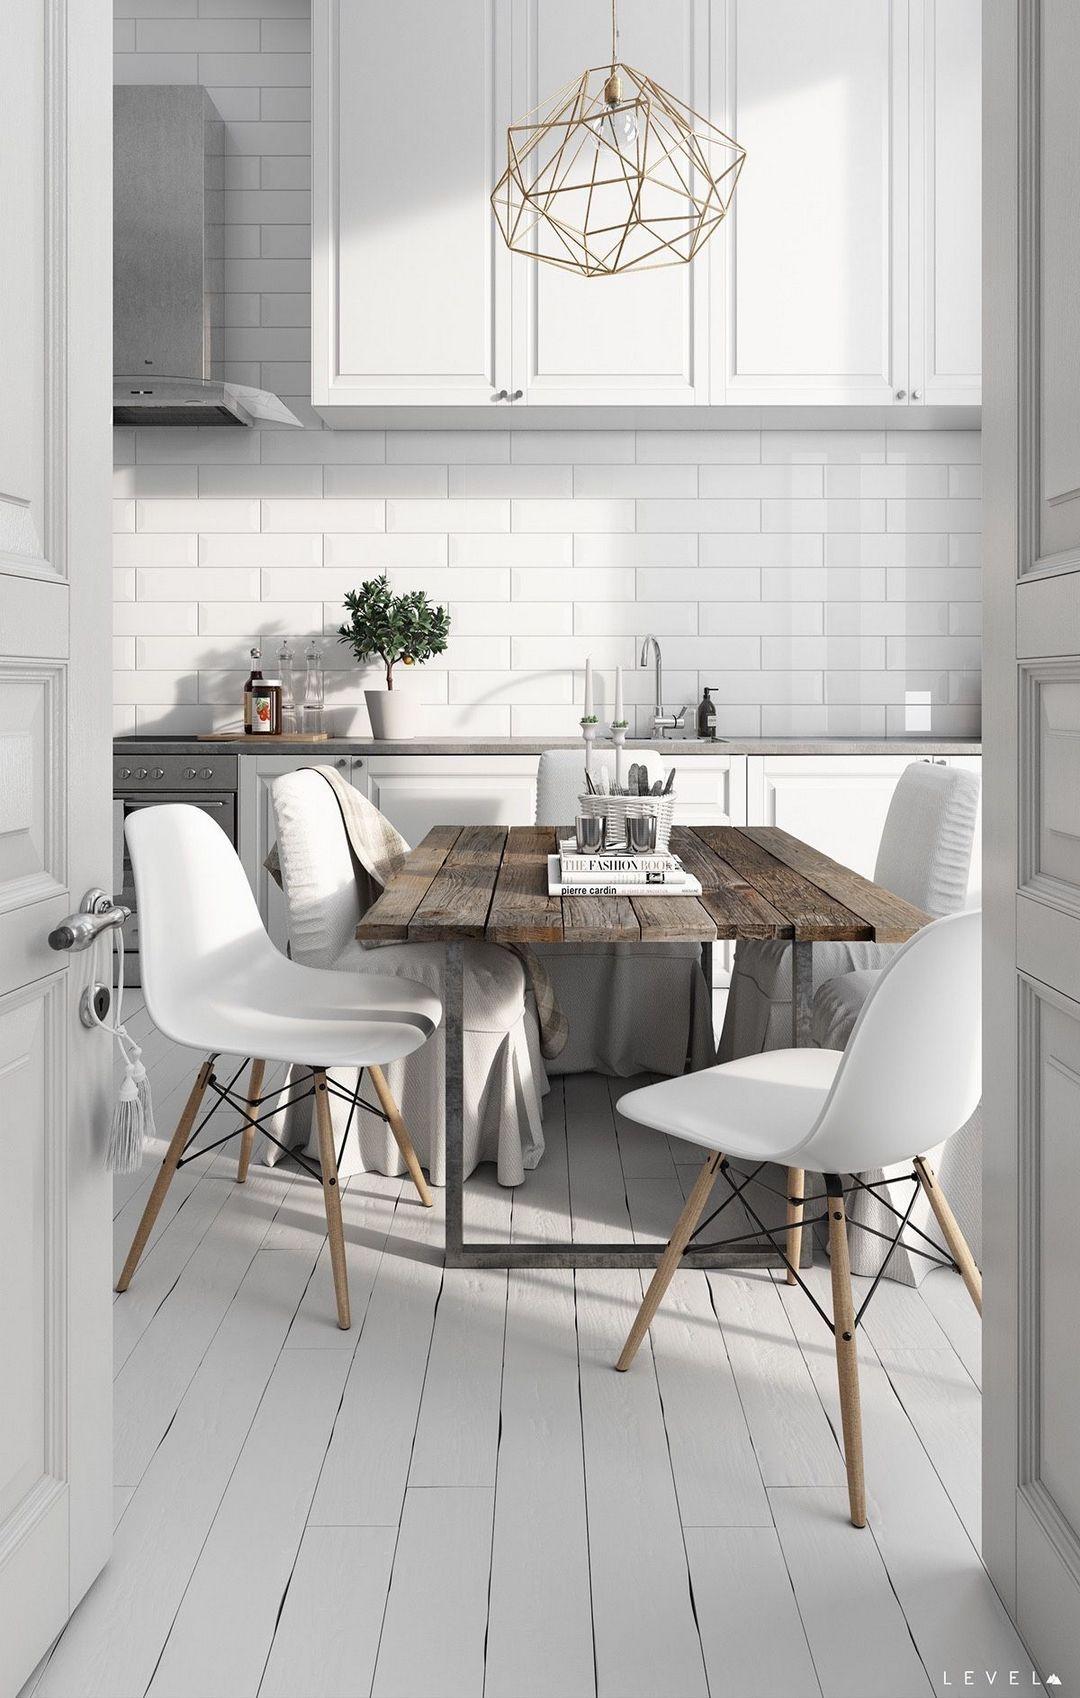 Wonderful Modern Scandinavian Kitchen Design 22 Interior De Cocina Cocina Escandinava Cocinas Rusticas